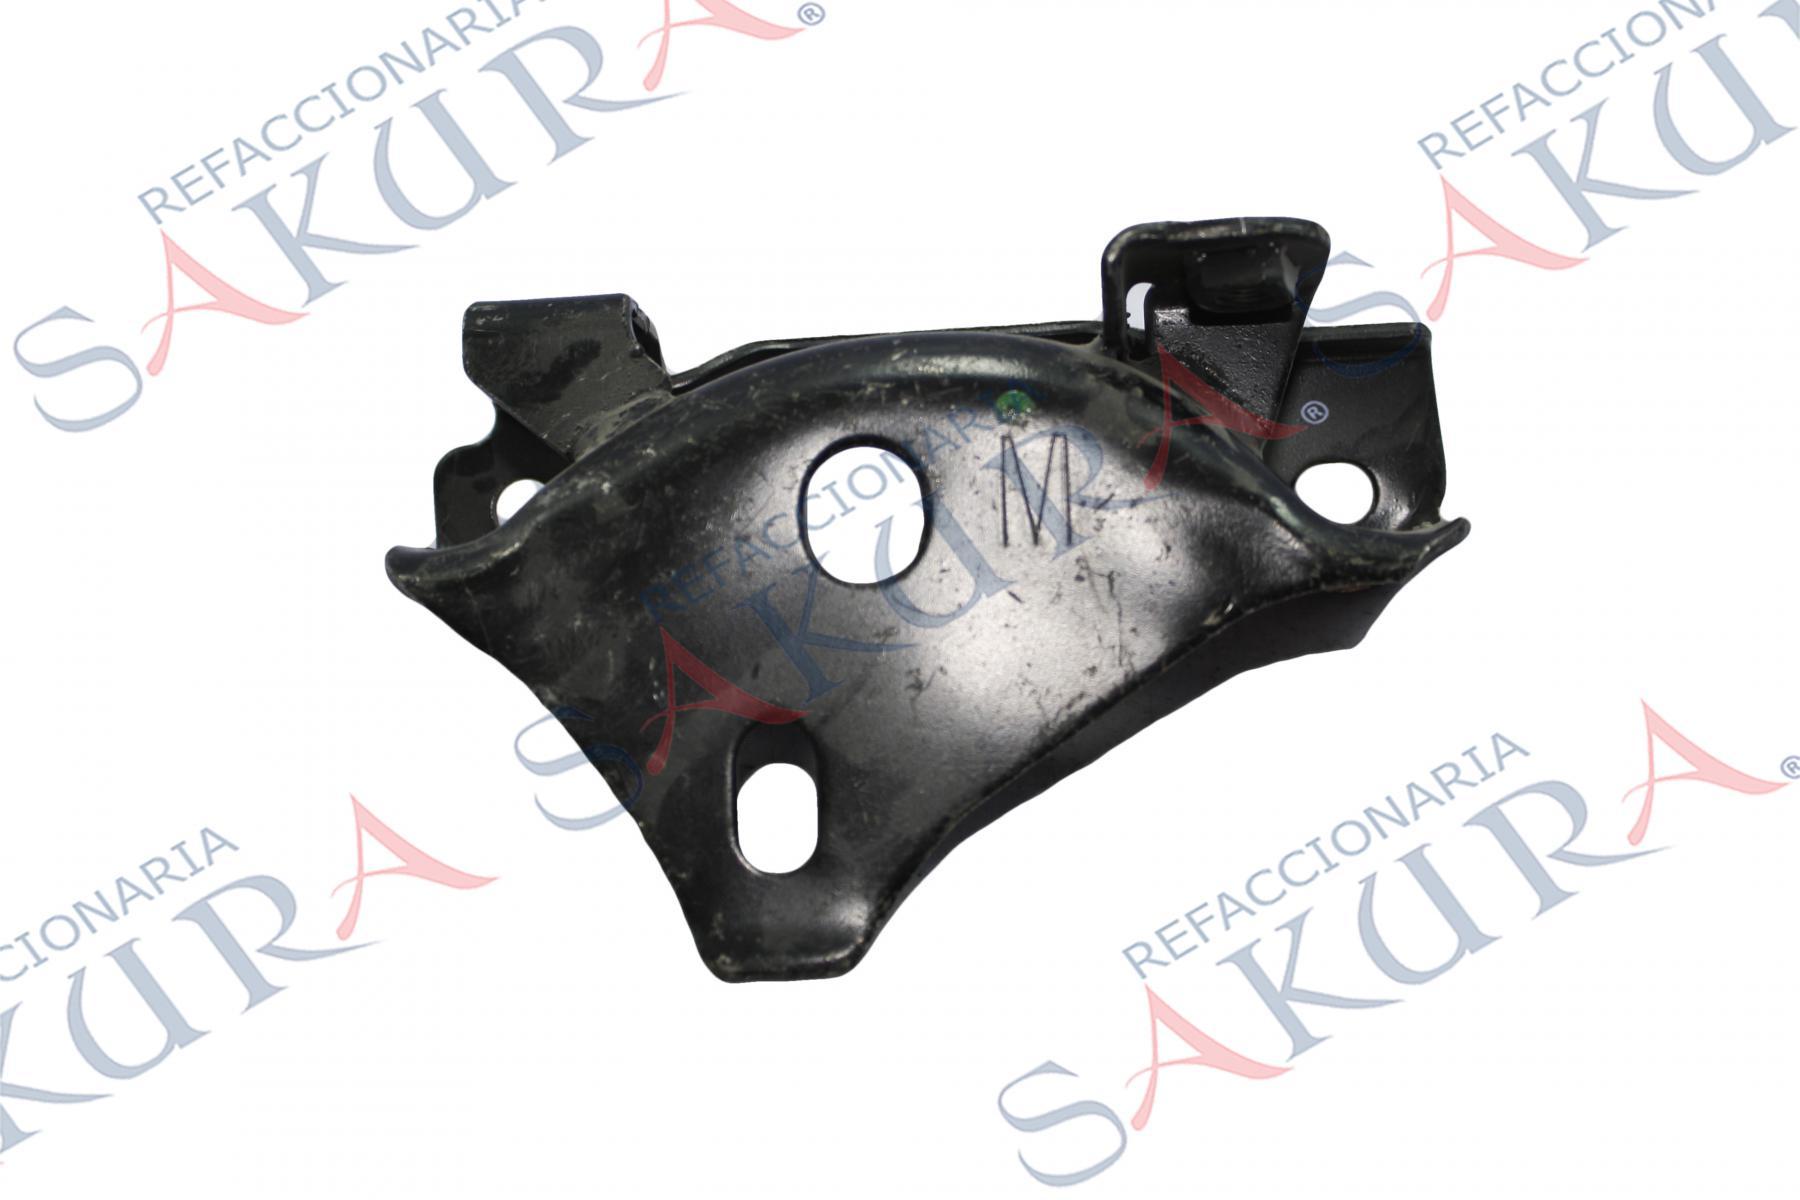 11253F4101, Base Soporte Motor Inferior Trasero (Nissan)